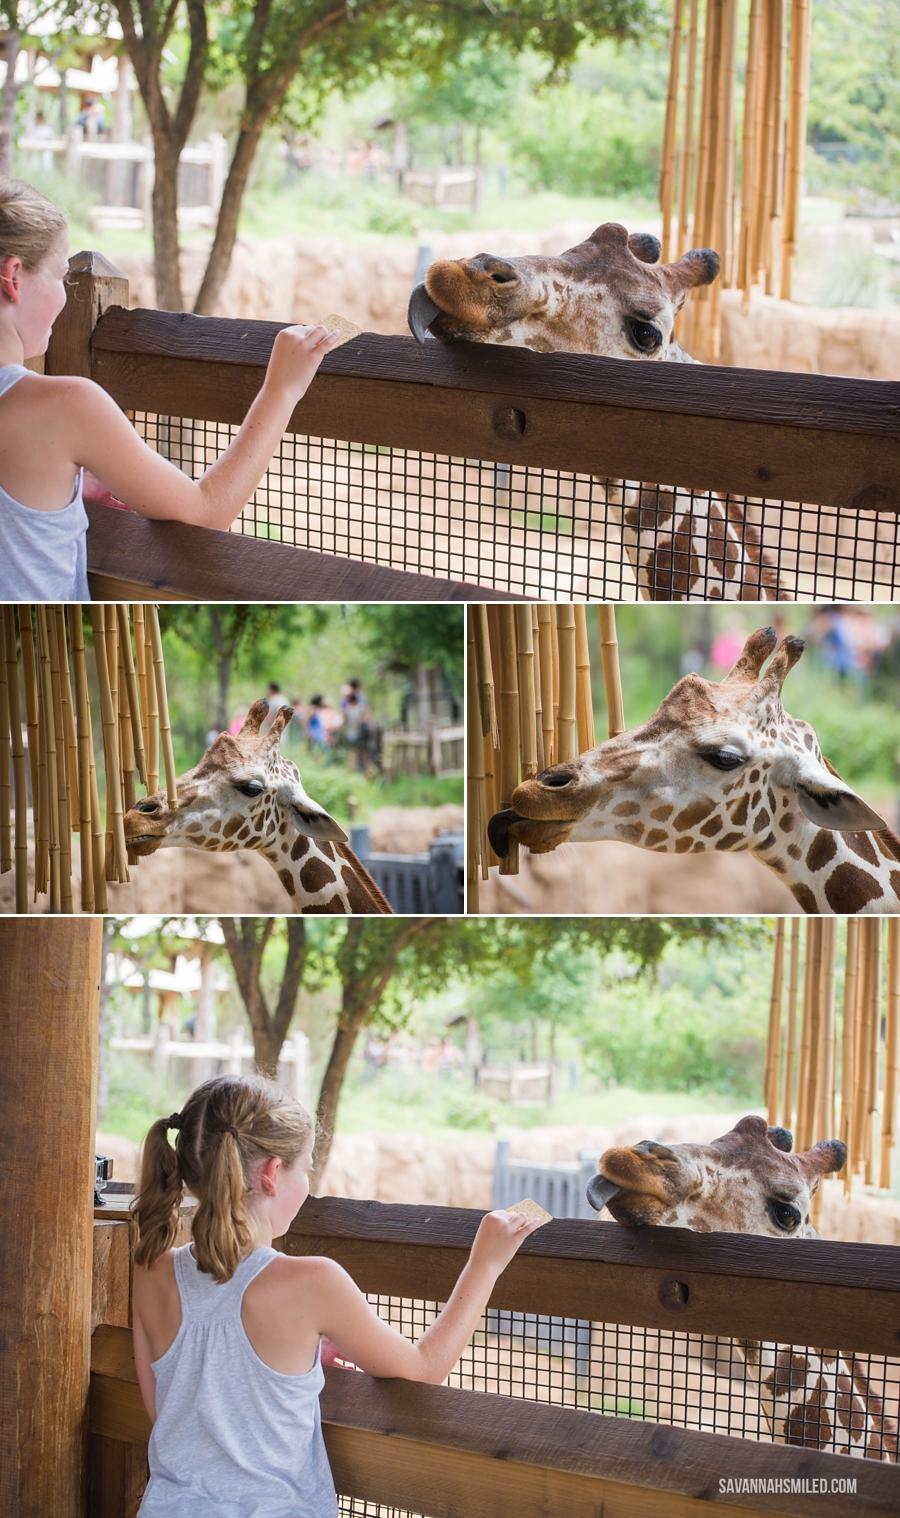 dallas-zoo-day-49.jpg